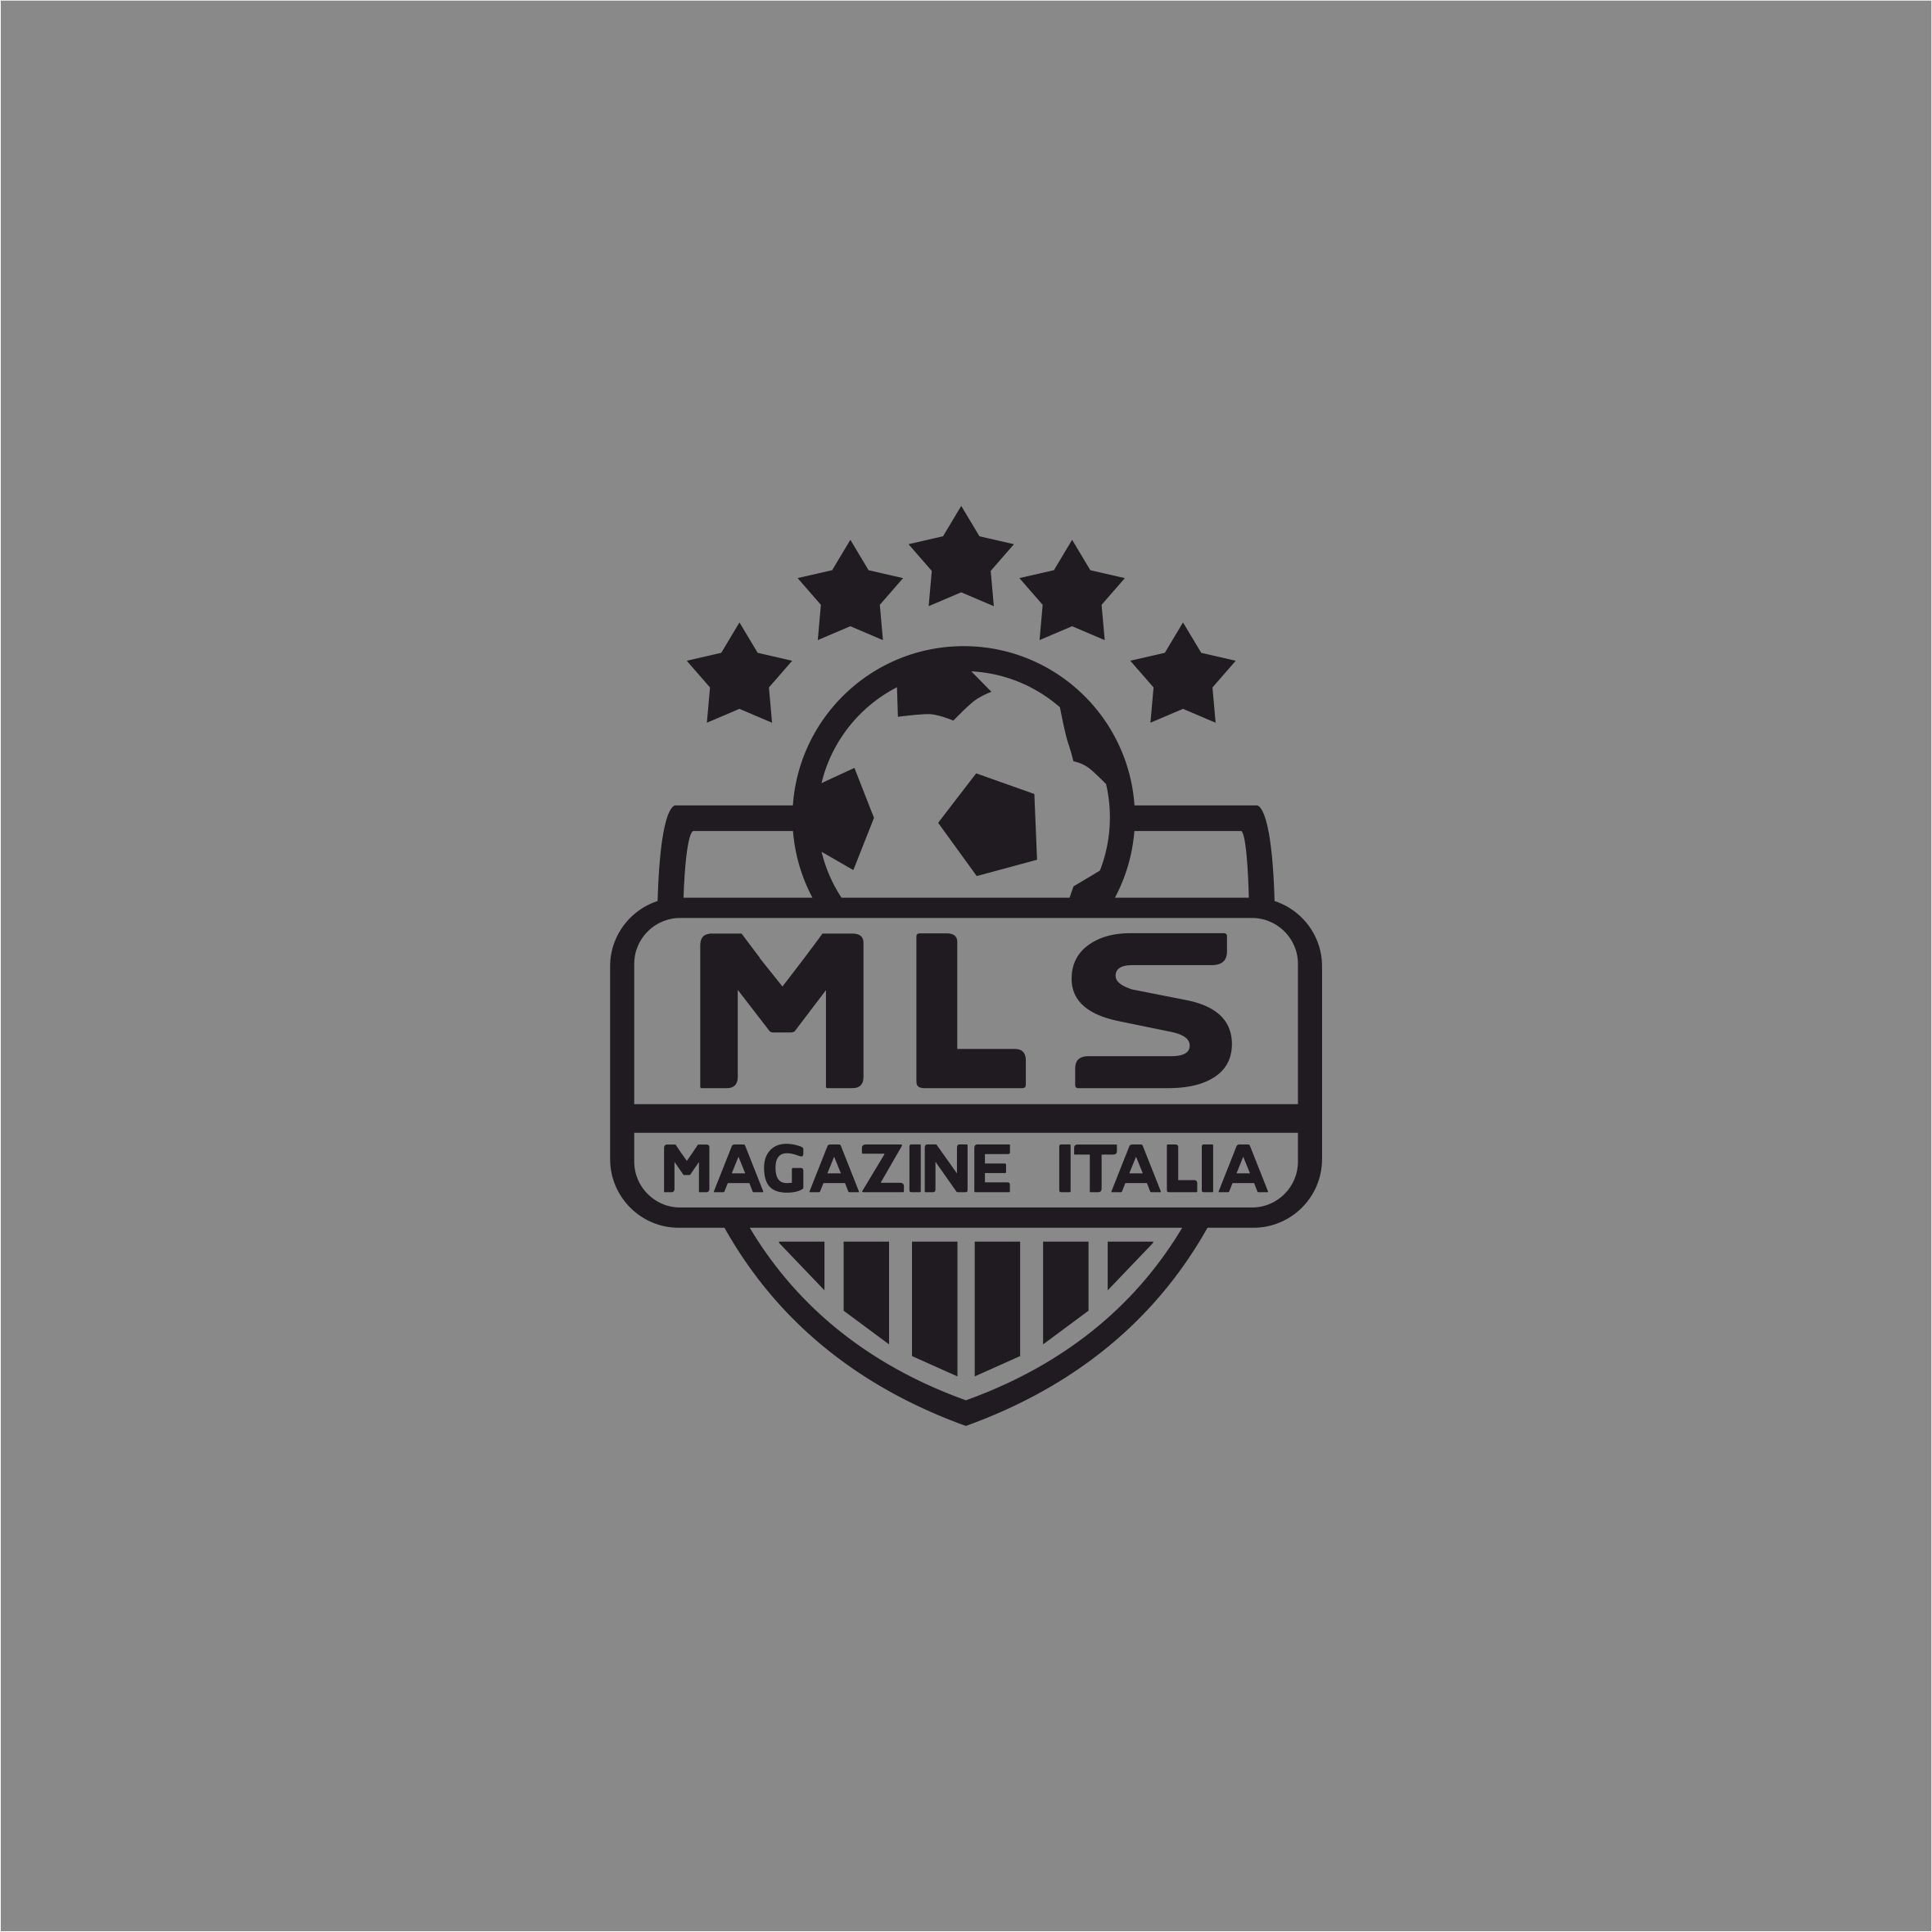 logo MLS Magazine Italia | MLS Magazine Italia